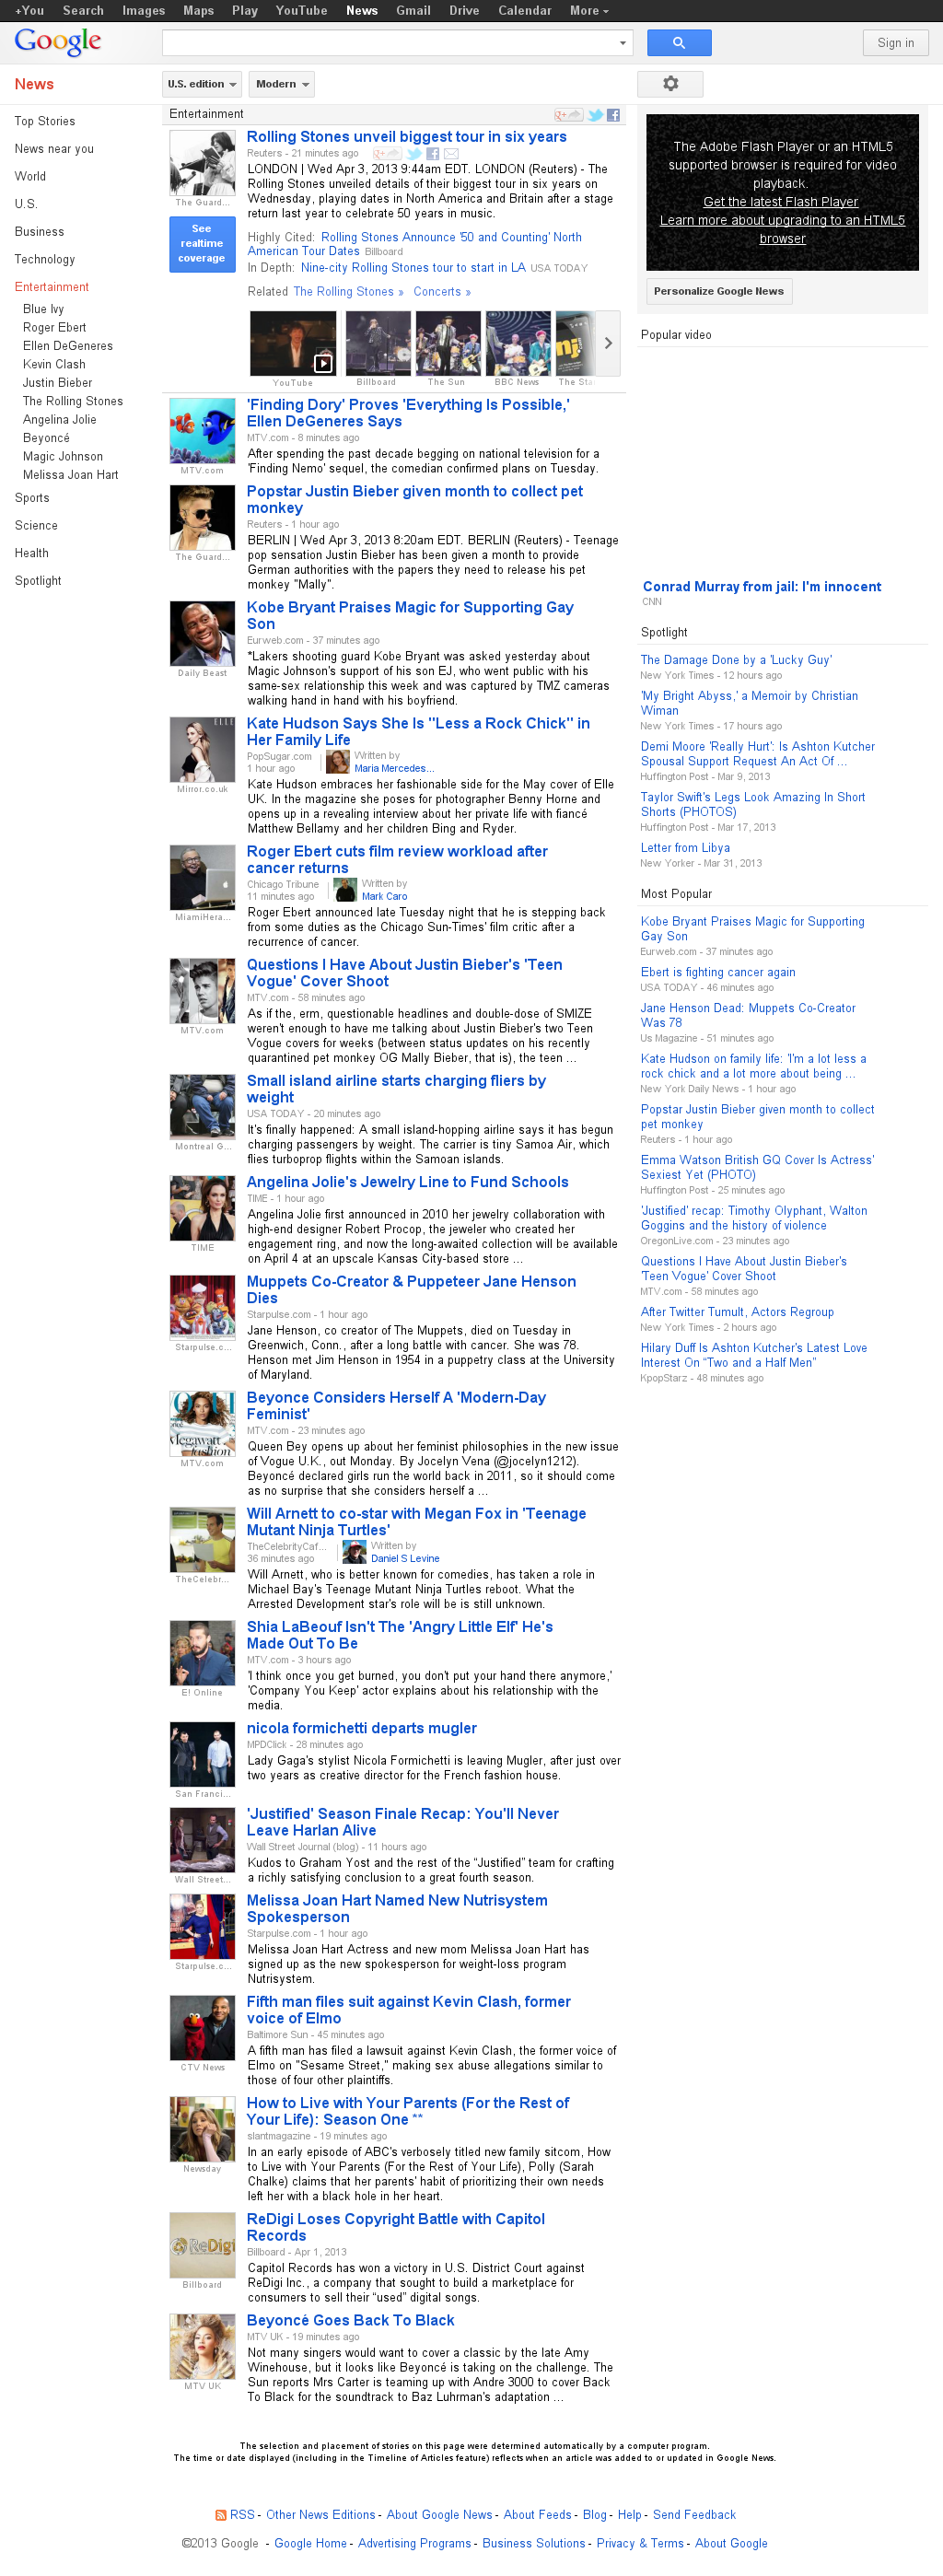 Google News: Entertainment at Wednesday April 3, 2013, 2:08 p.m. UTC